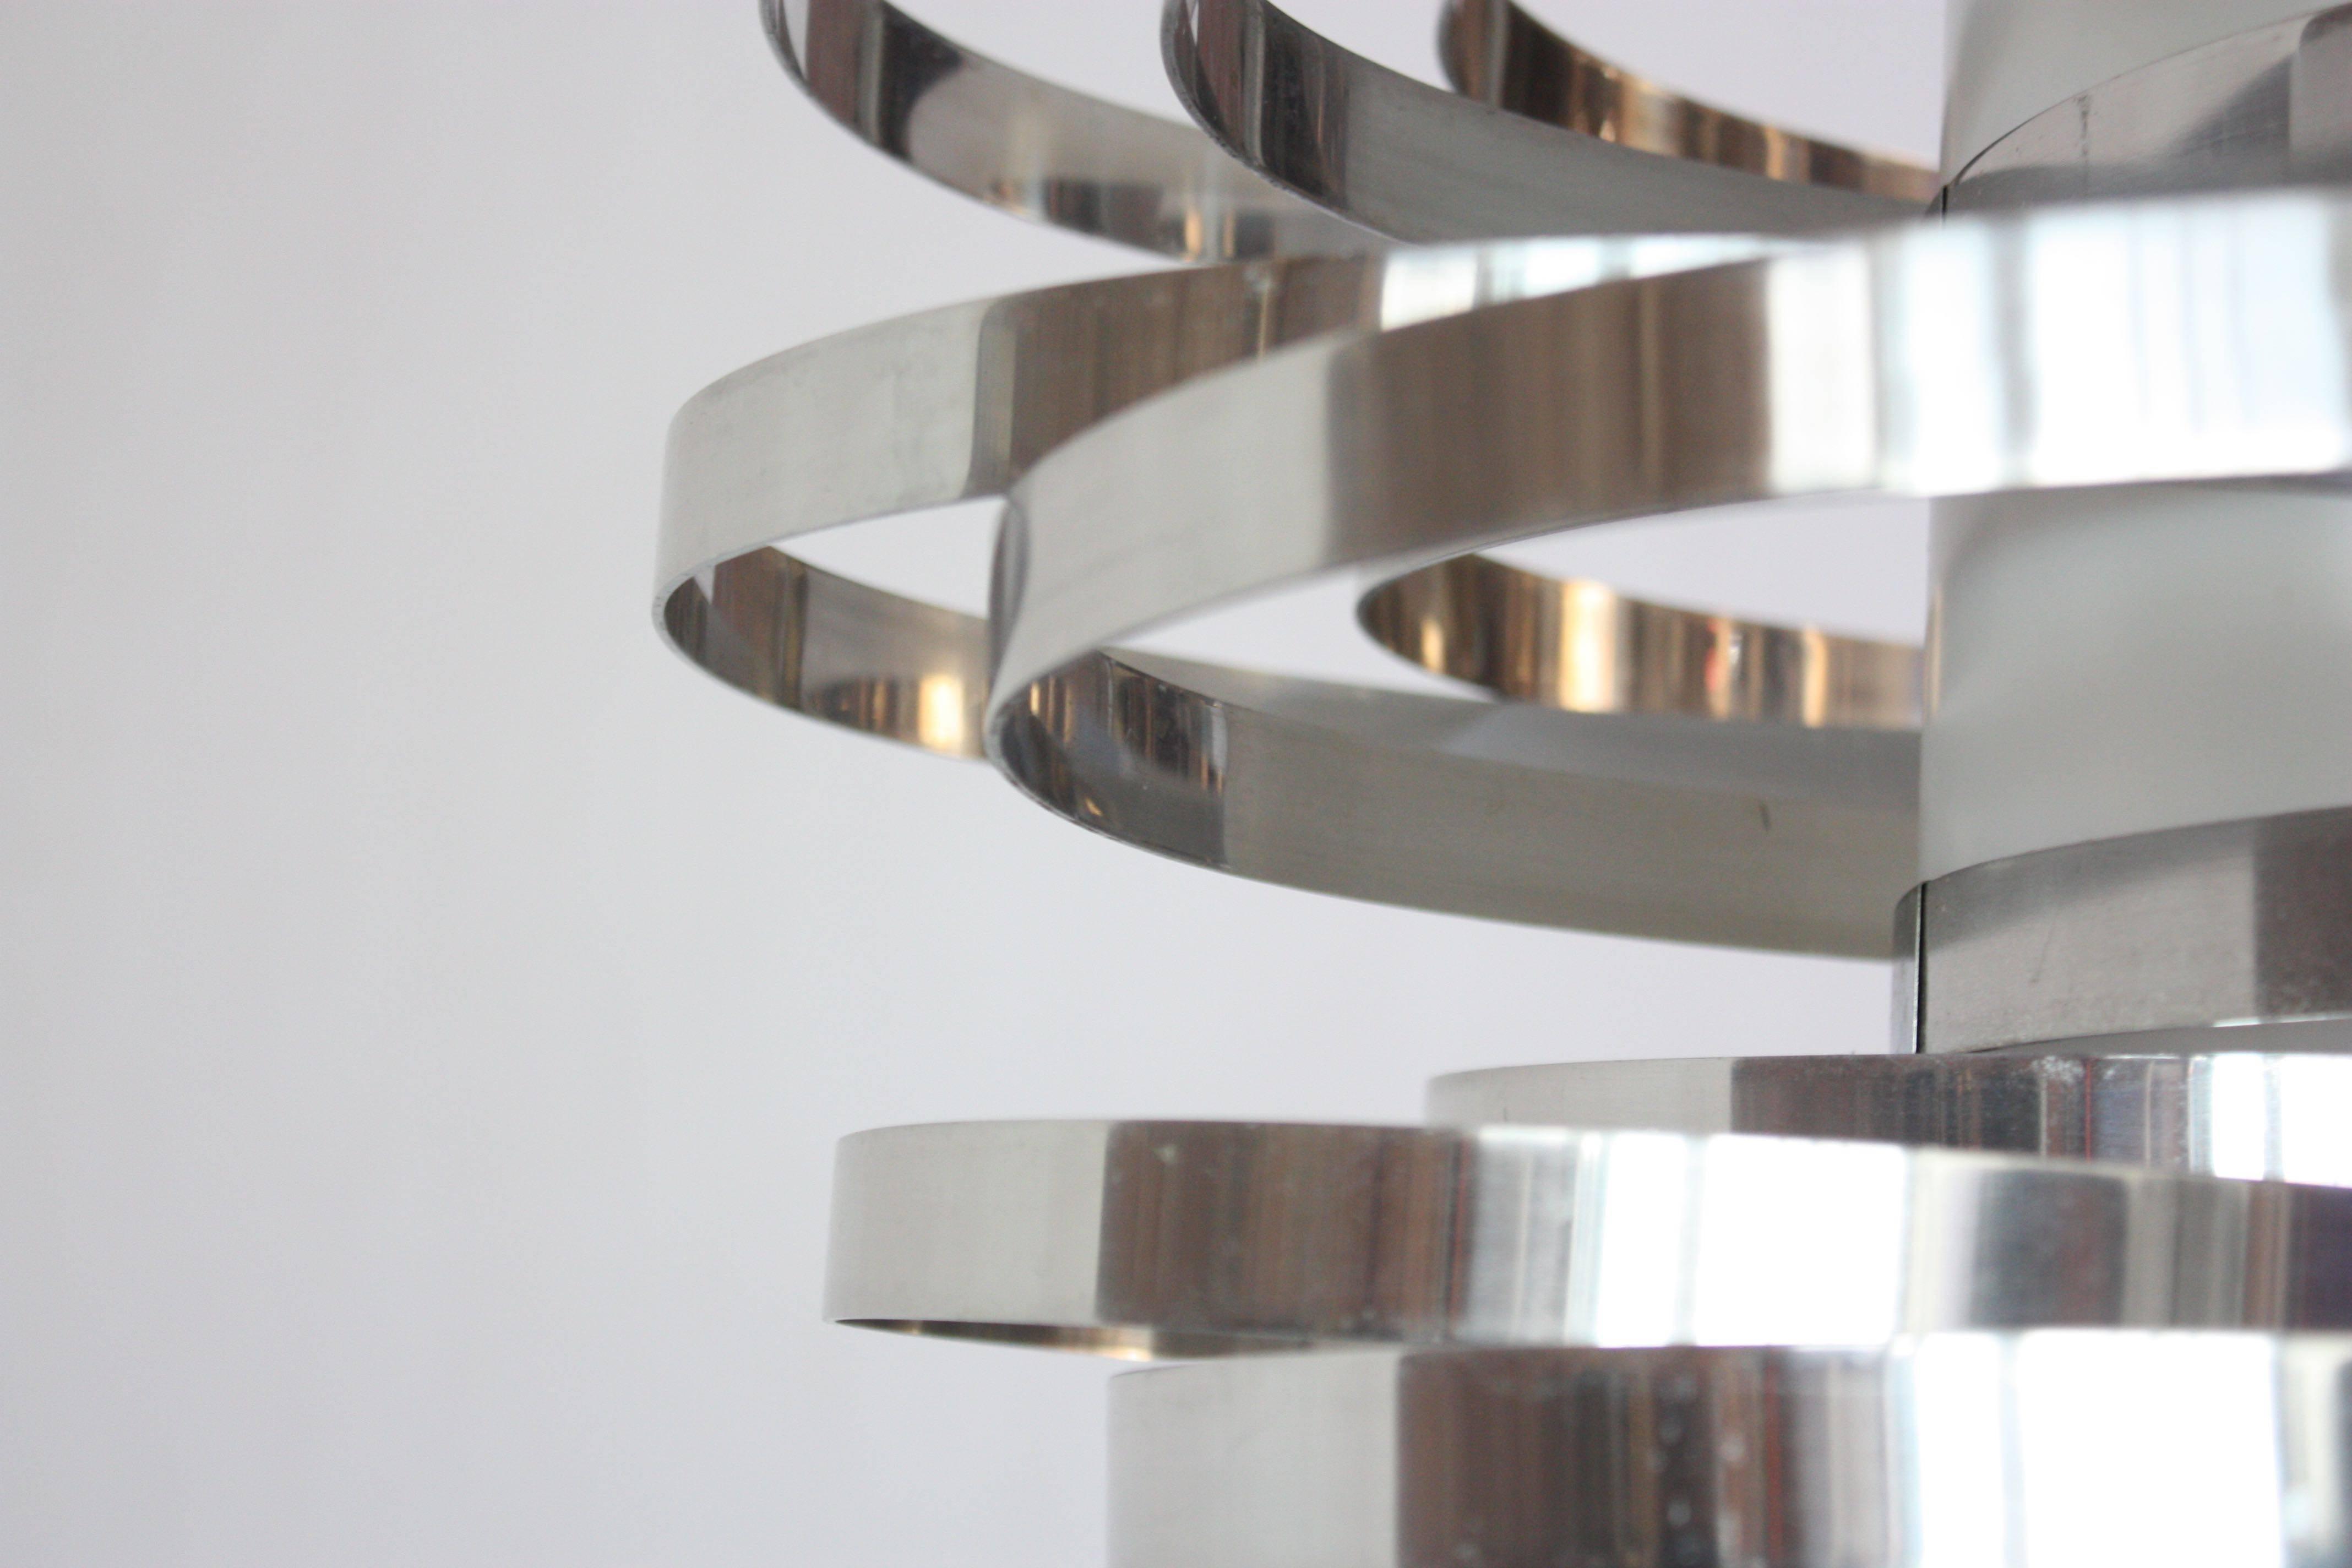 Polished Aluminum Cyclone Pendant Fixture By Gaetano Sciolari For Sale At 1stdibs